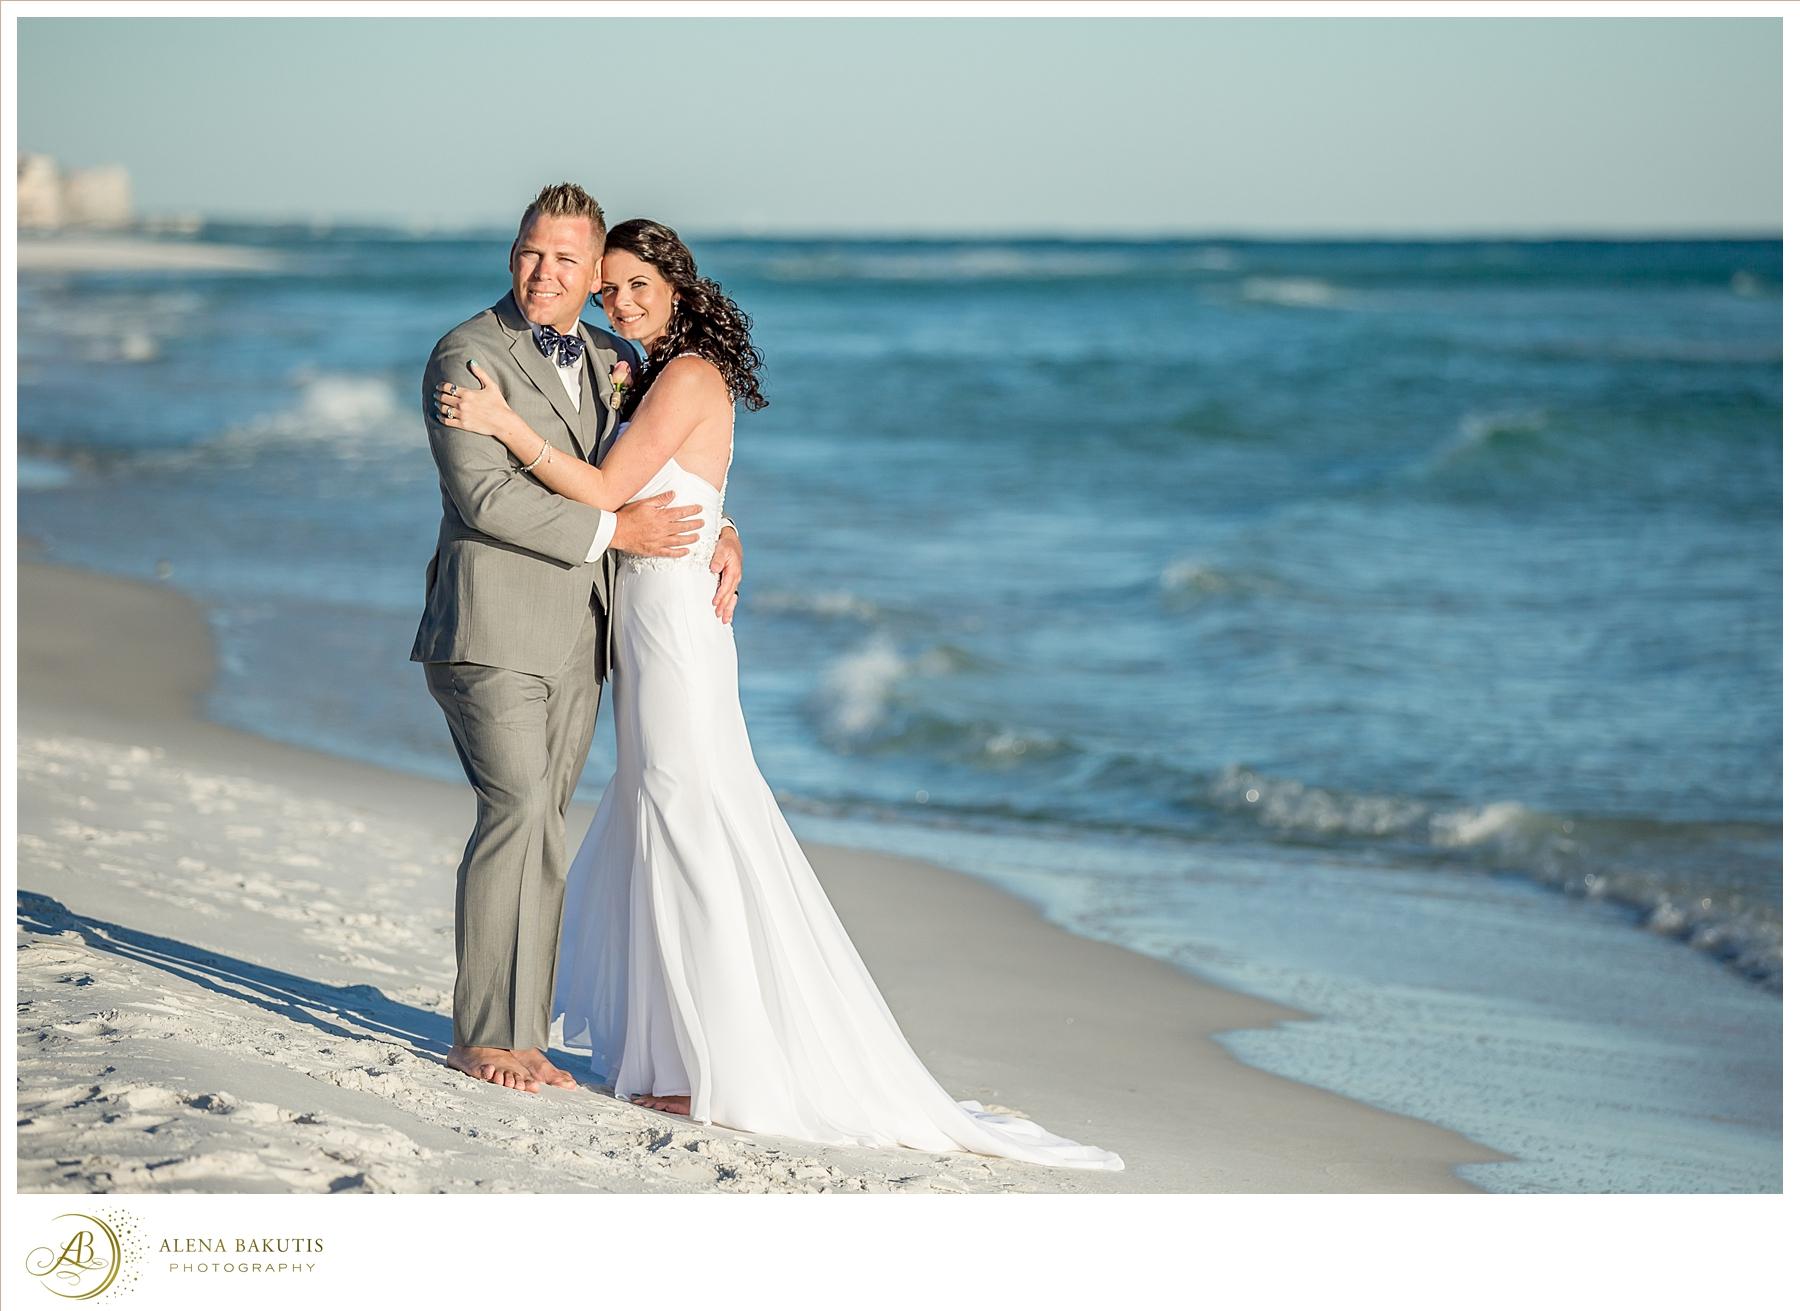 destin beach weddings Alena Bakutis Photography - Amber Brandon-454_WEB